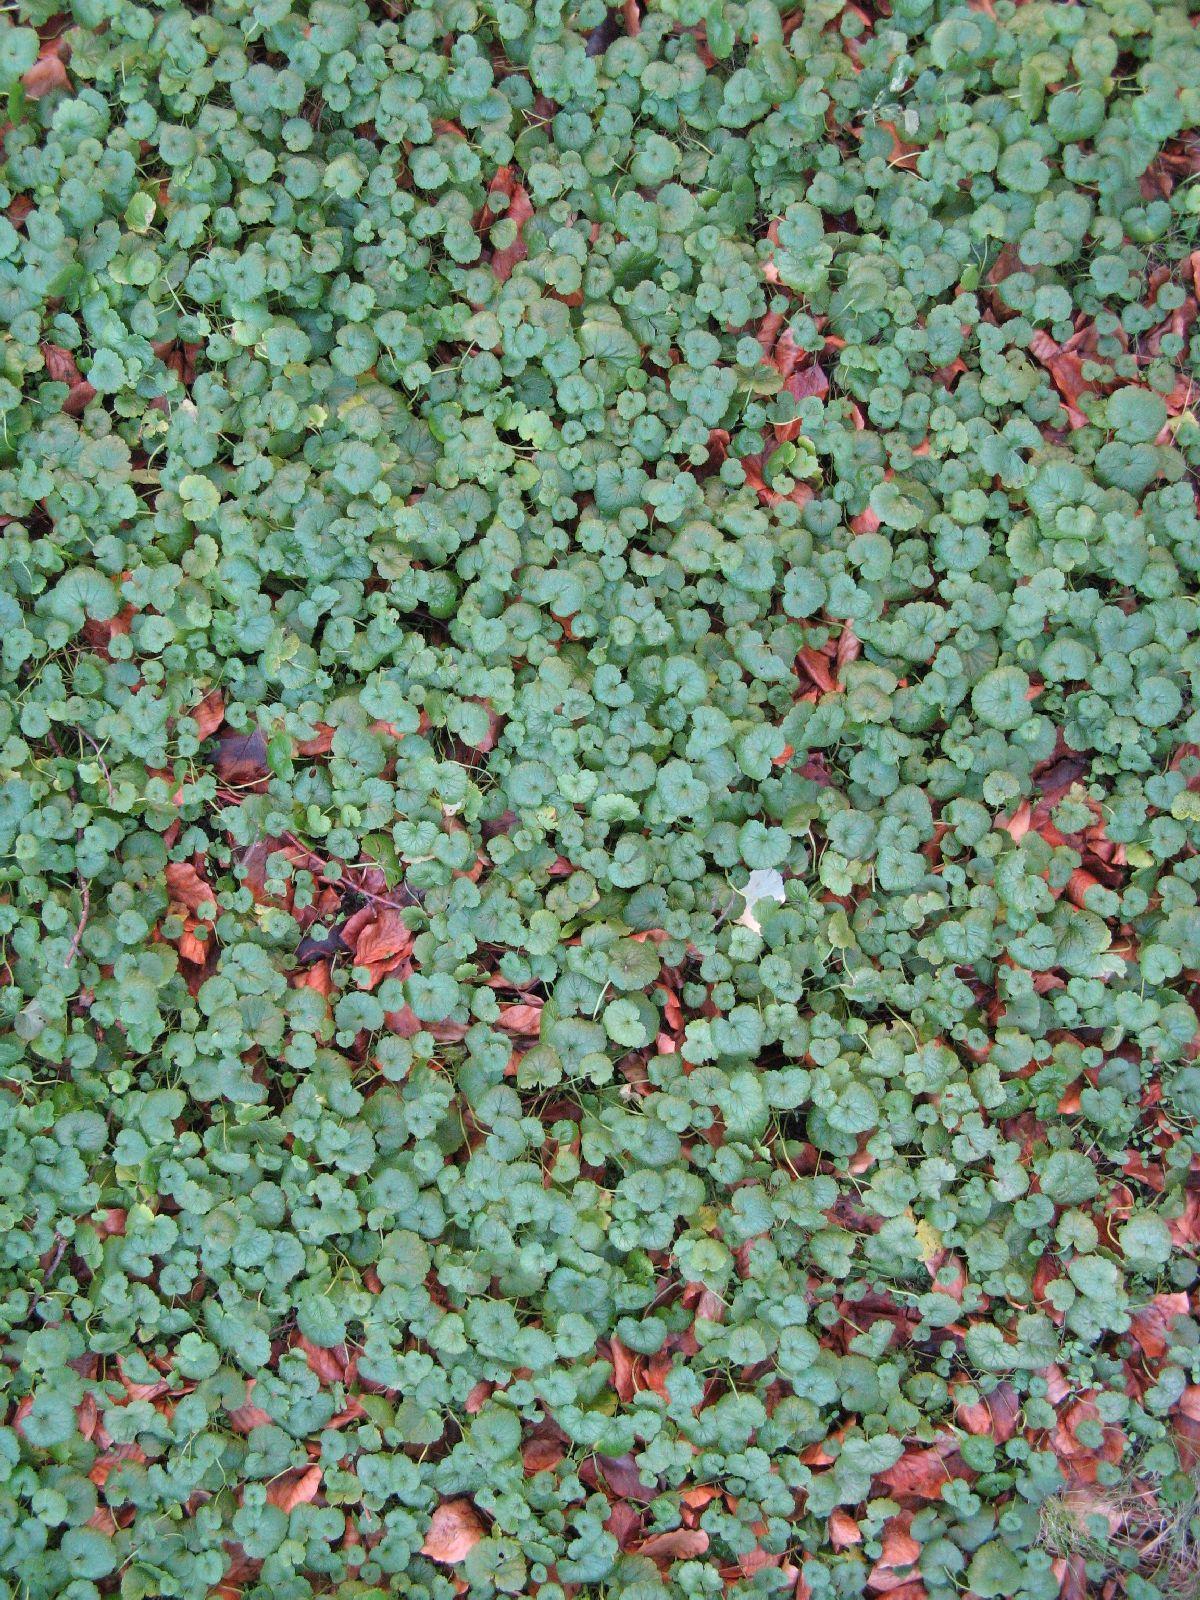 Boden-Gras-Moos-Blumen_Textur_B_02732